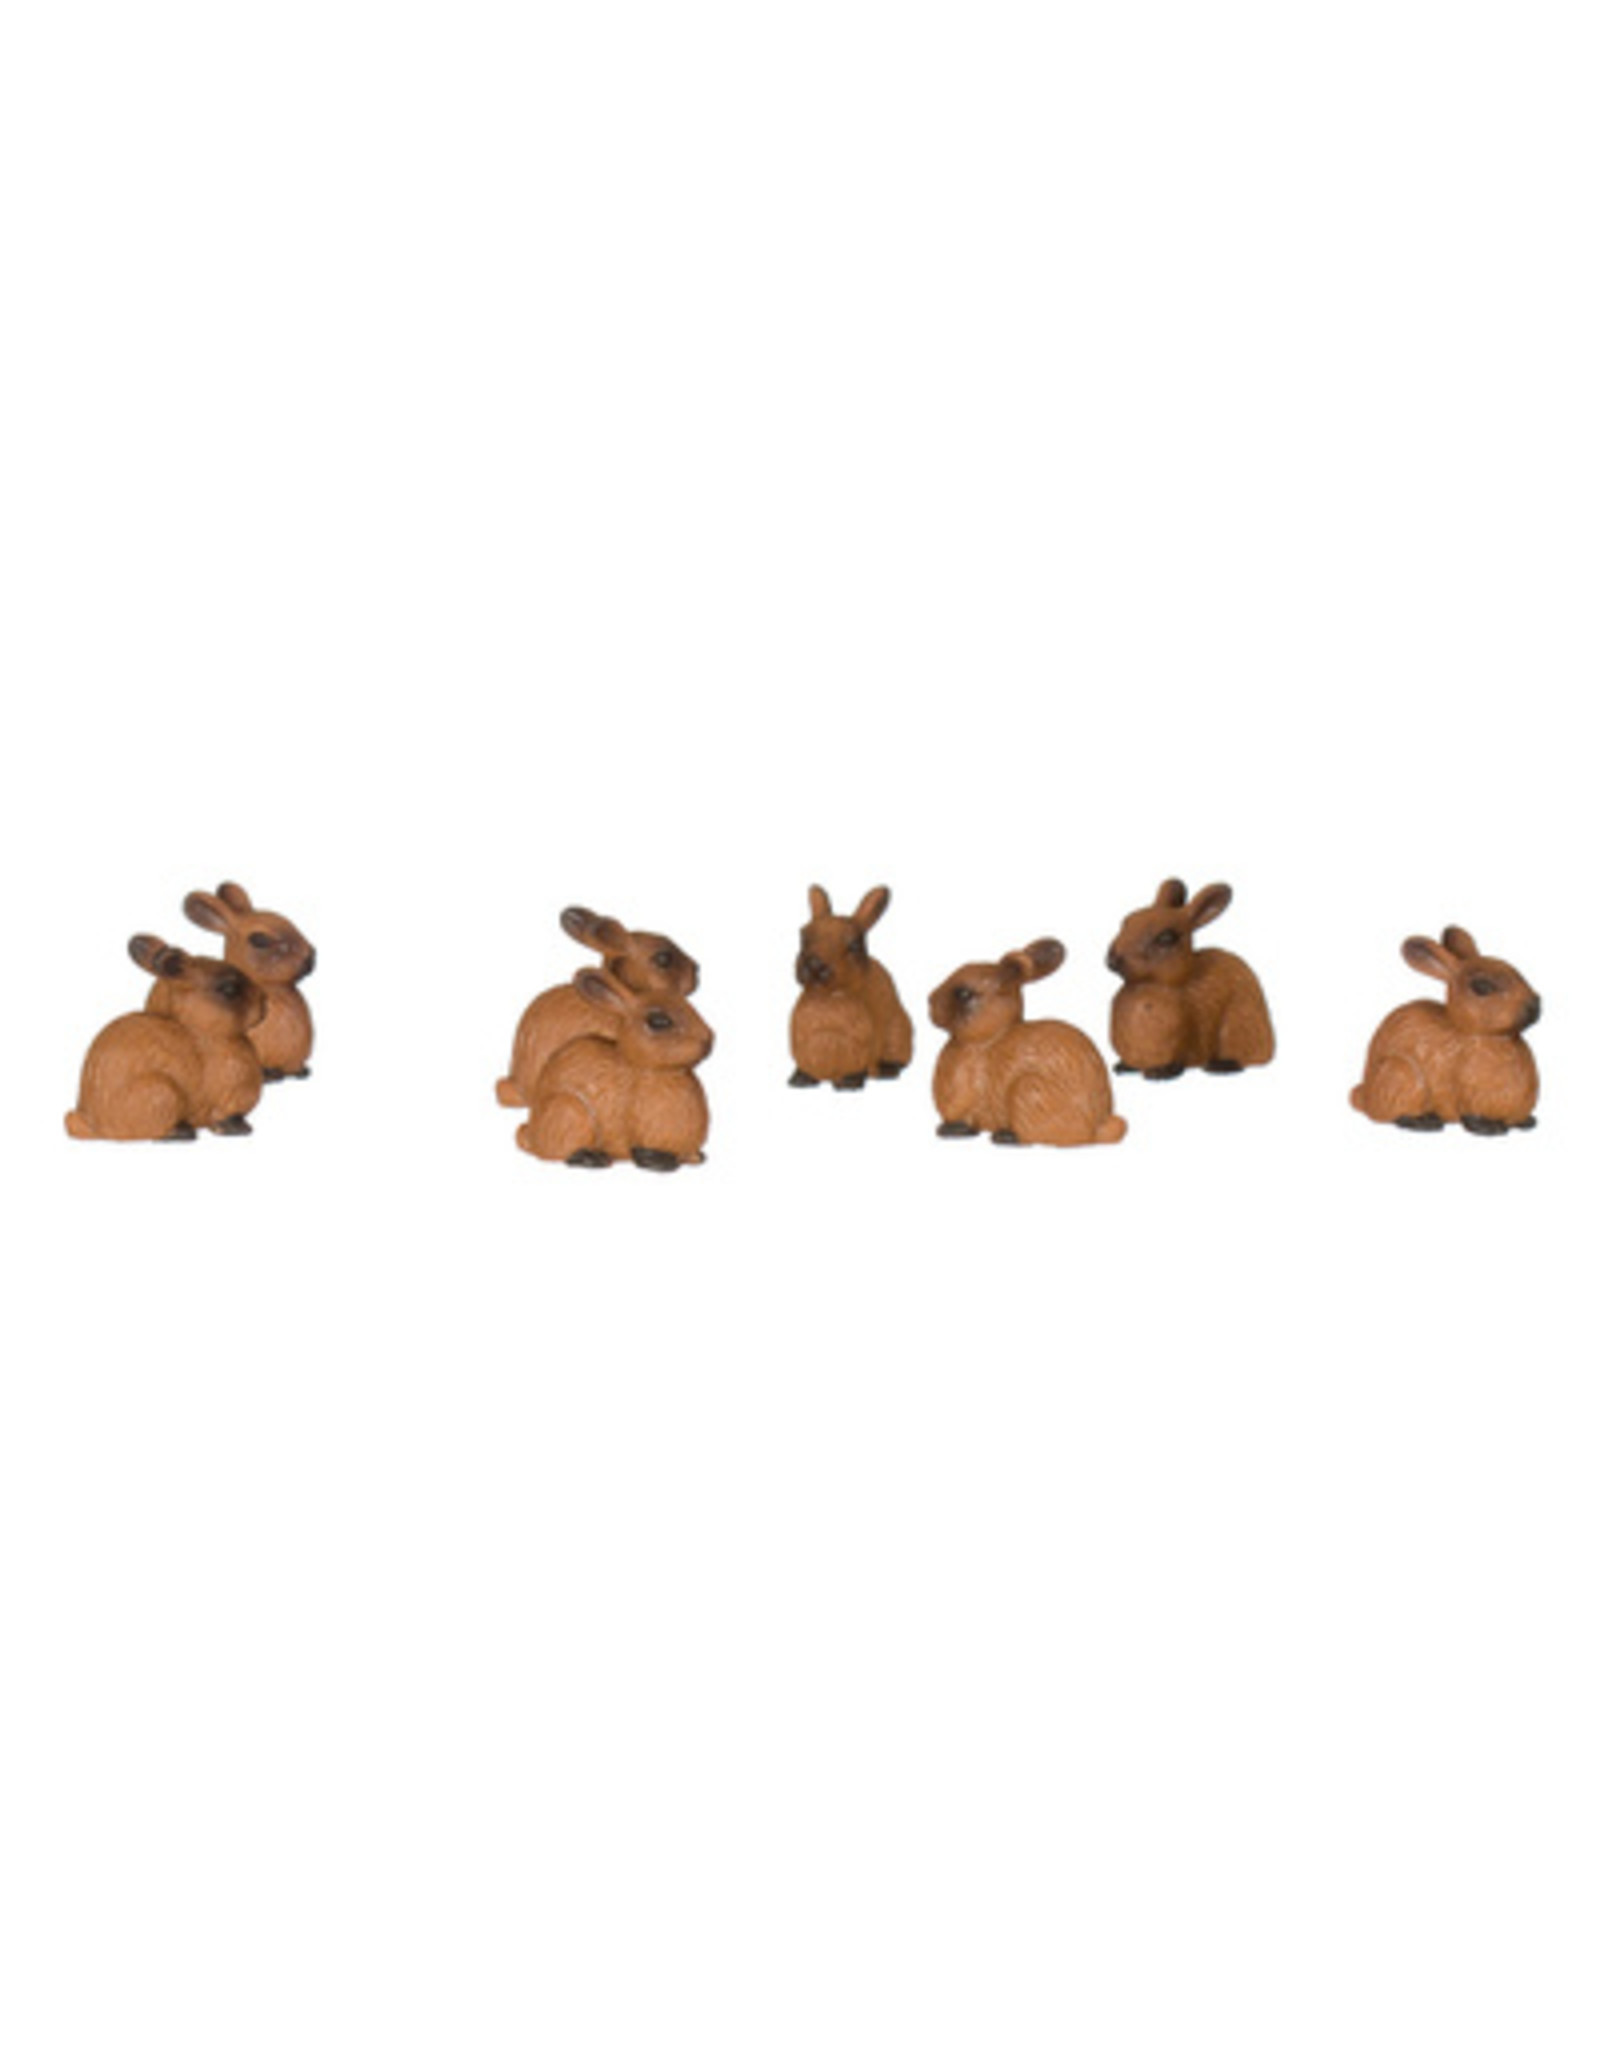 Goodluck mini - rabbit